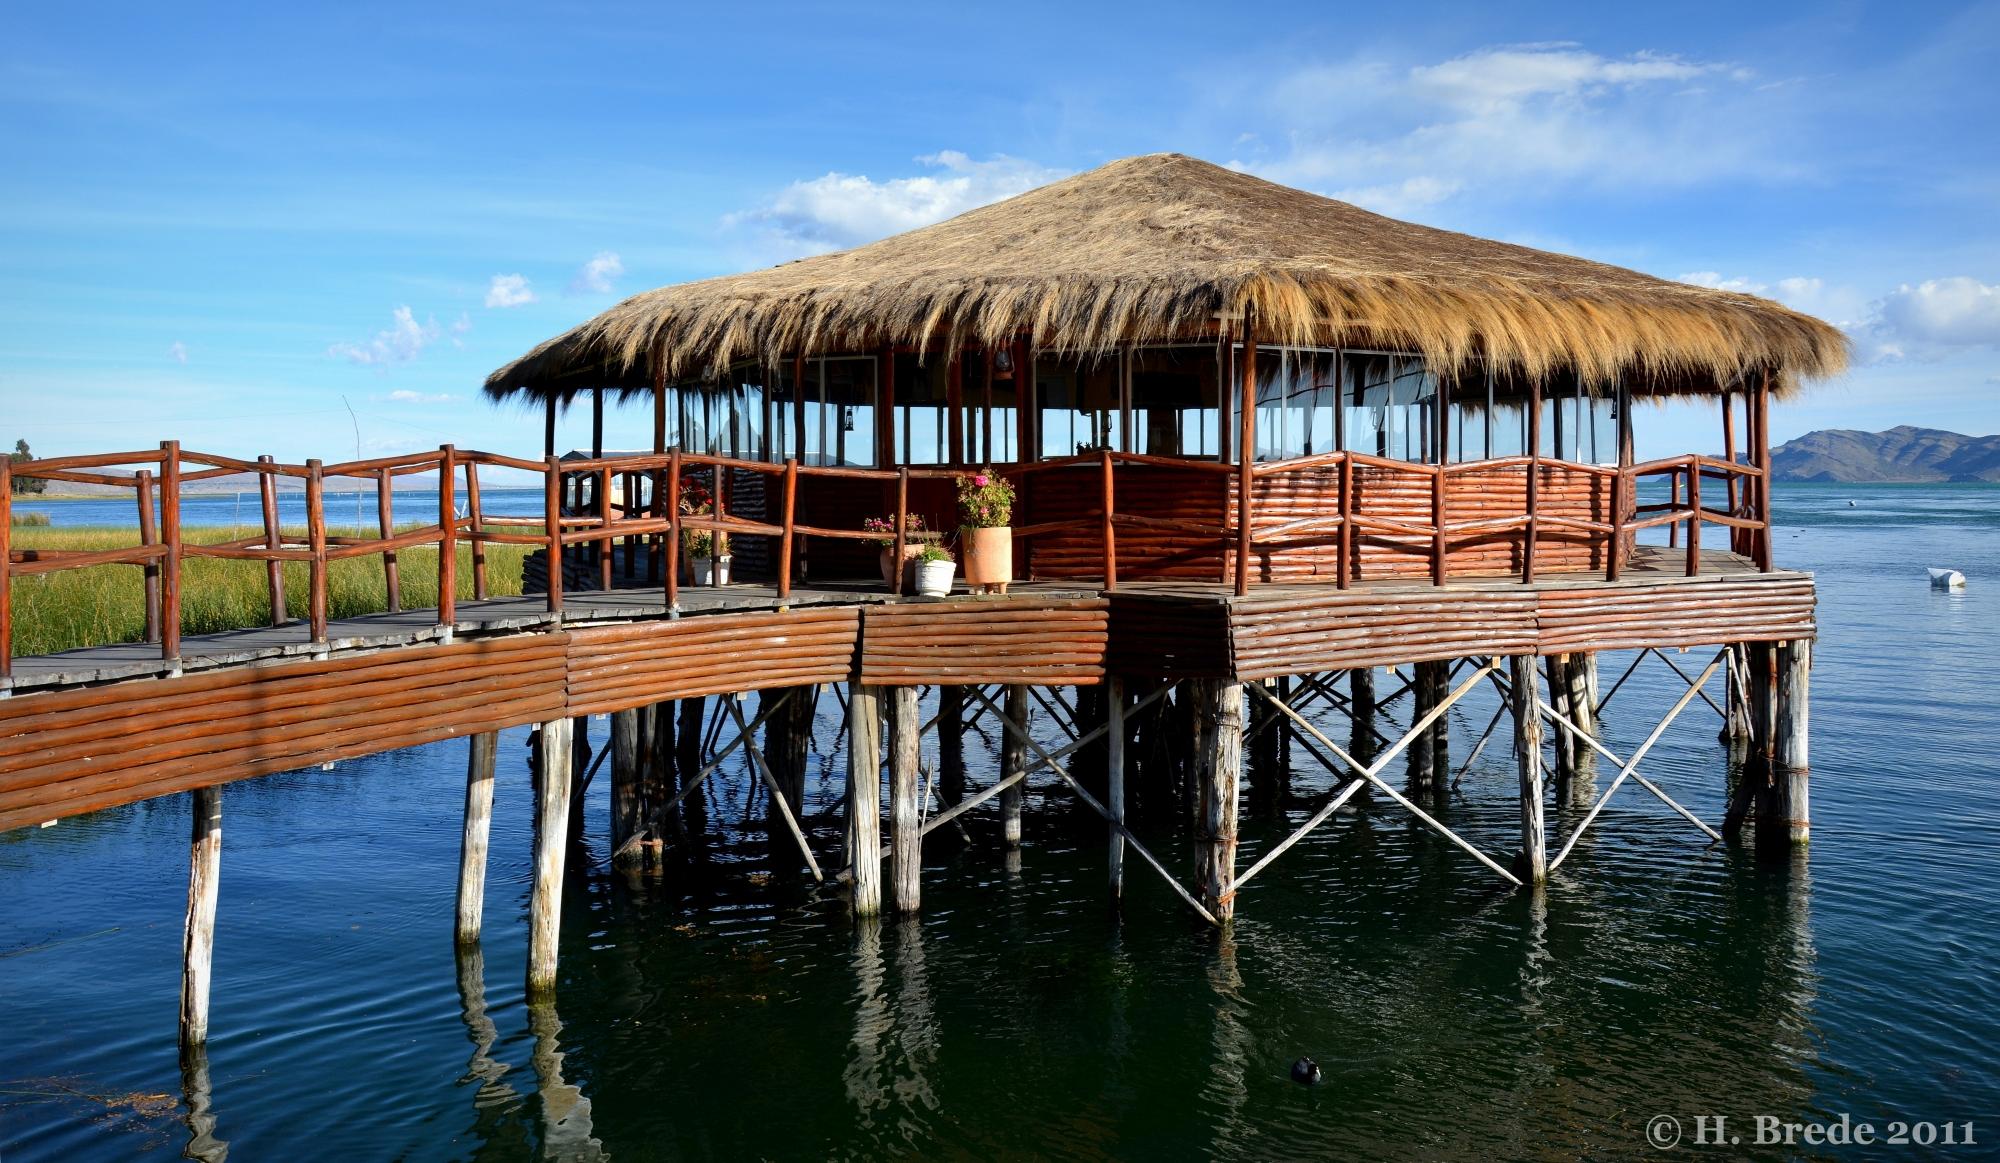 On Lake Titicaca, Peru